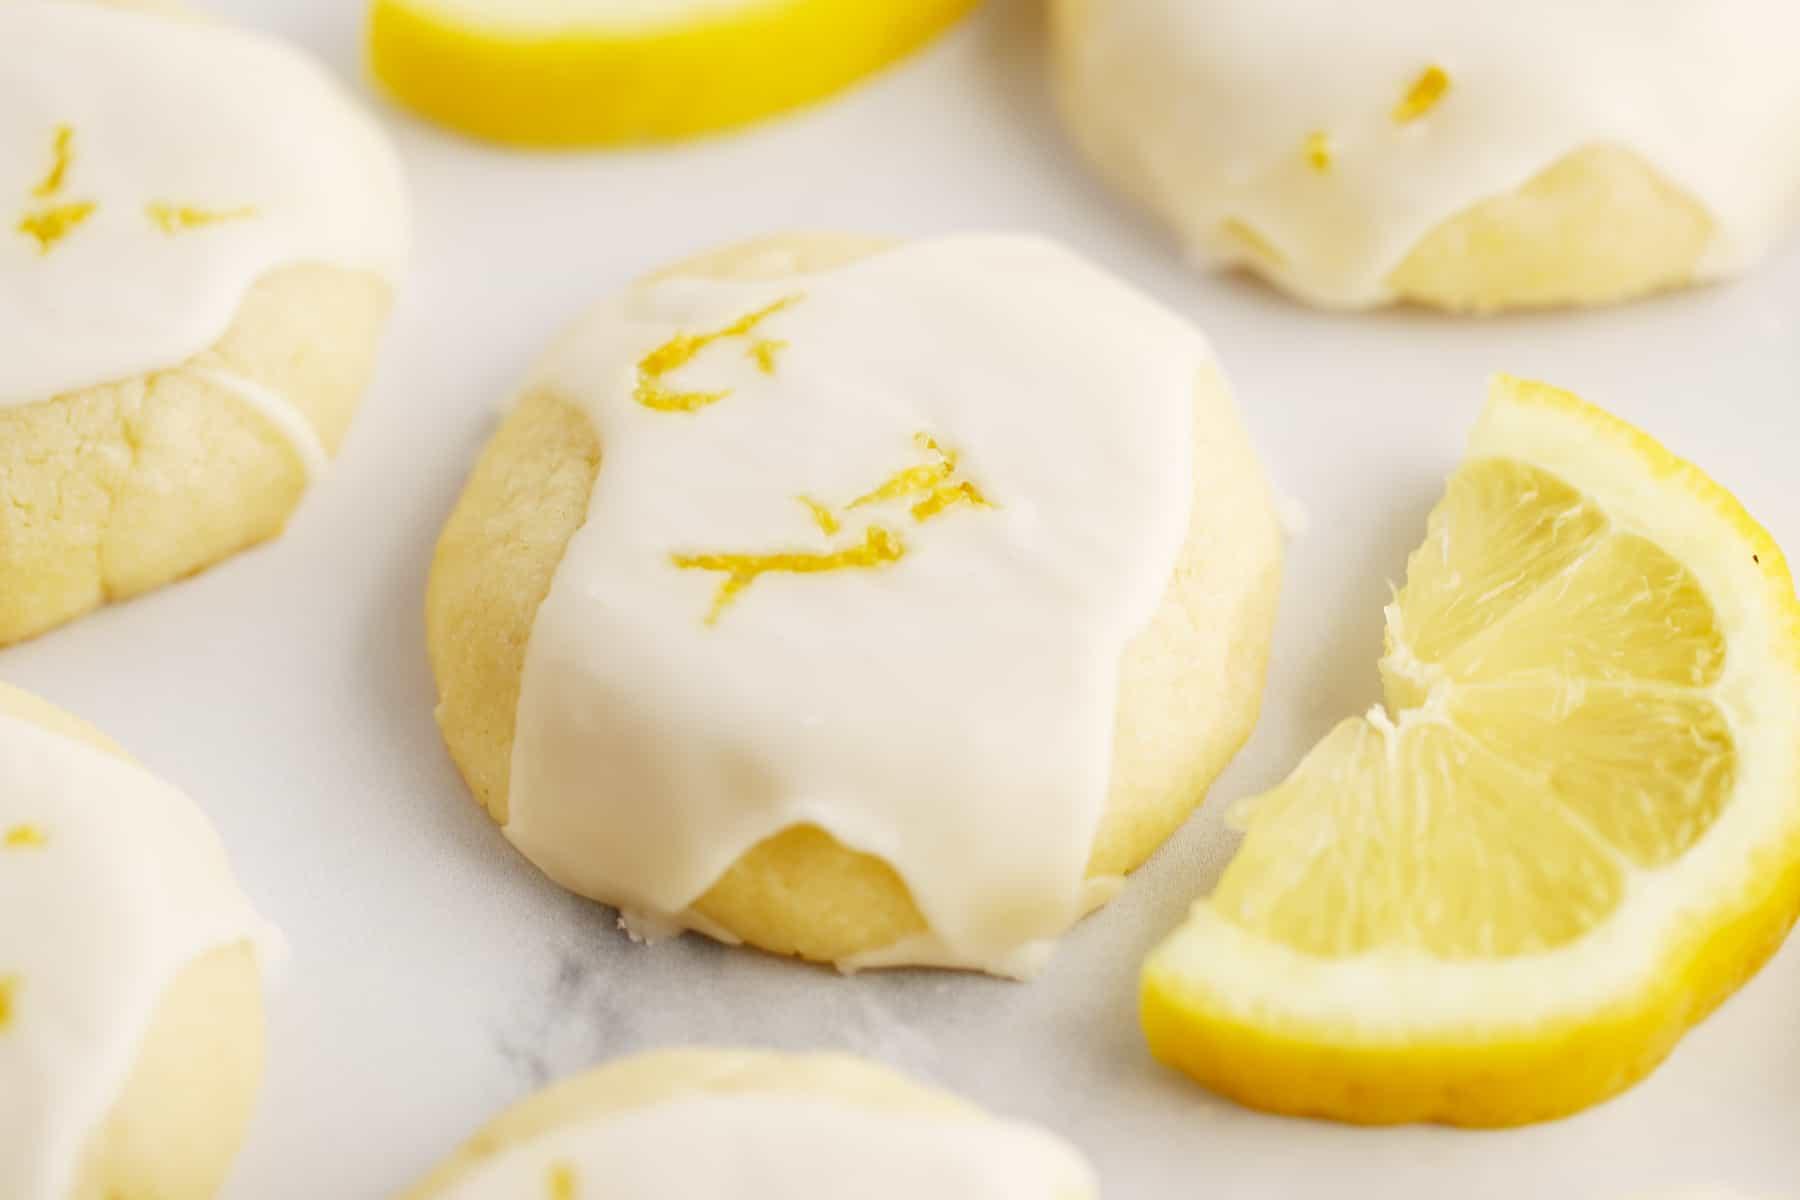 Glazed cookies on a tabletop garnished with lemon zest.